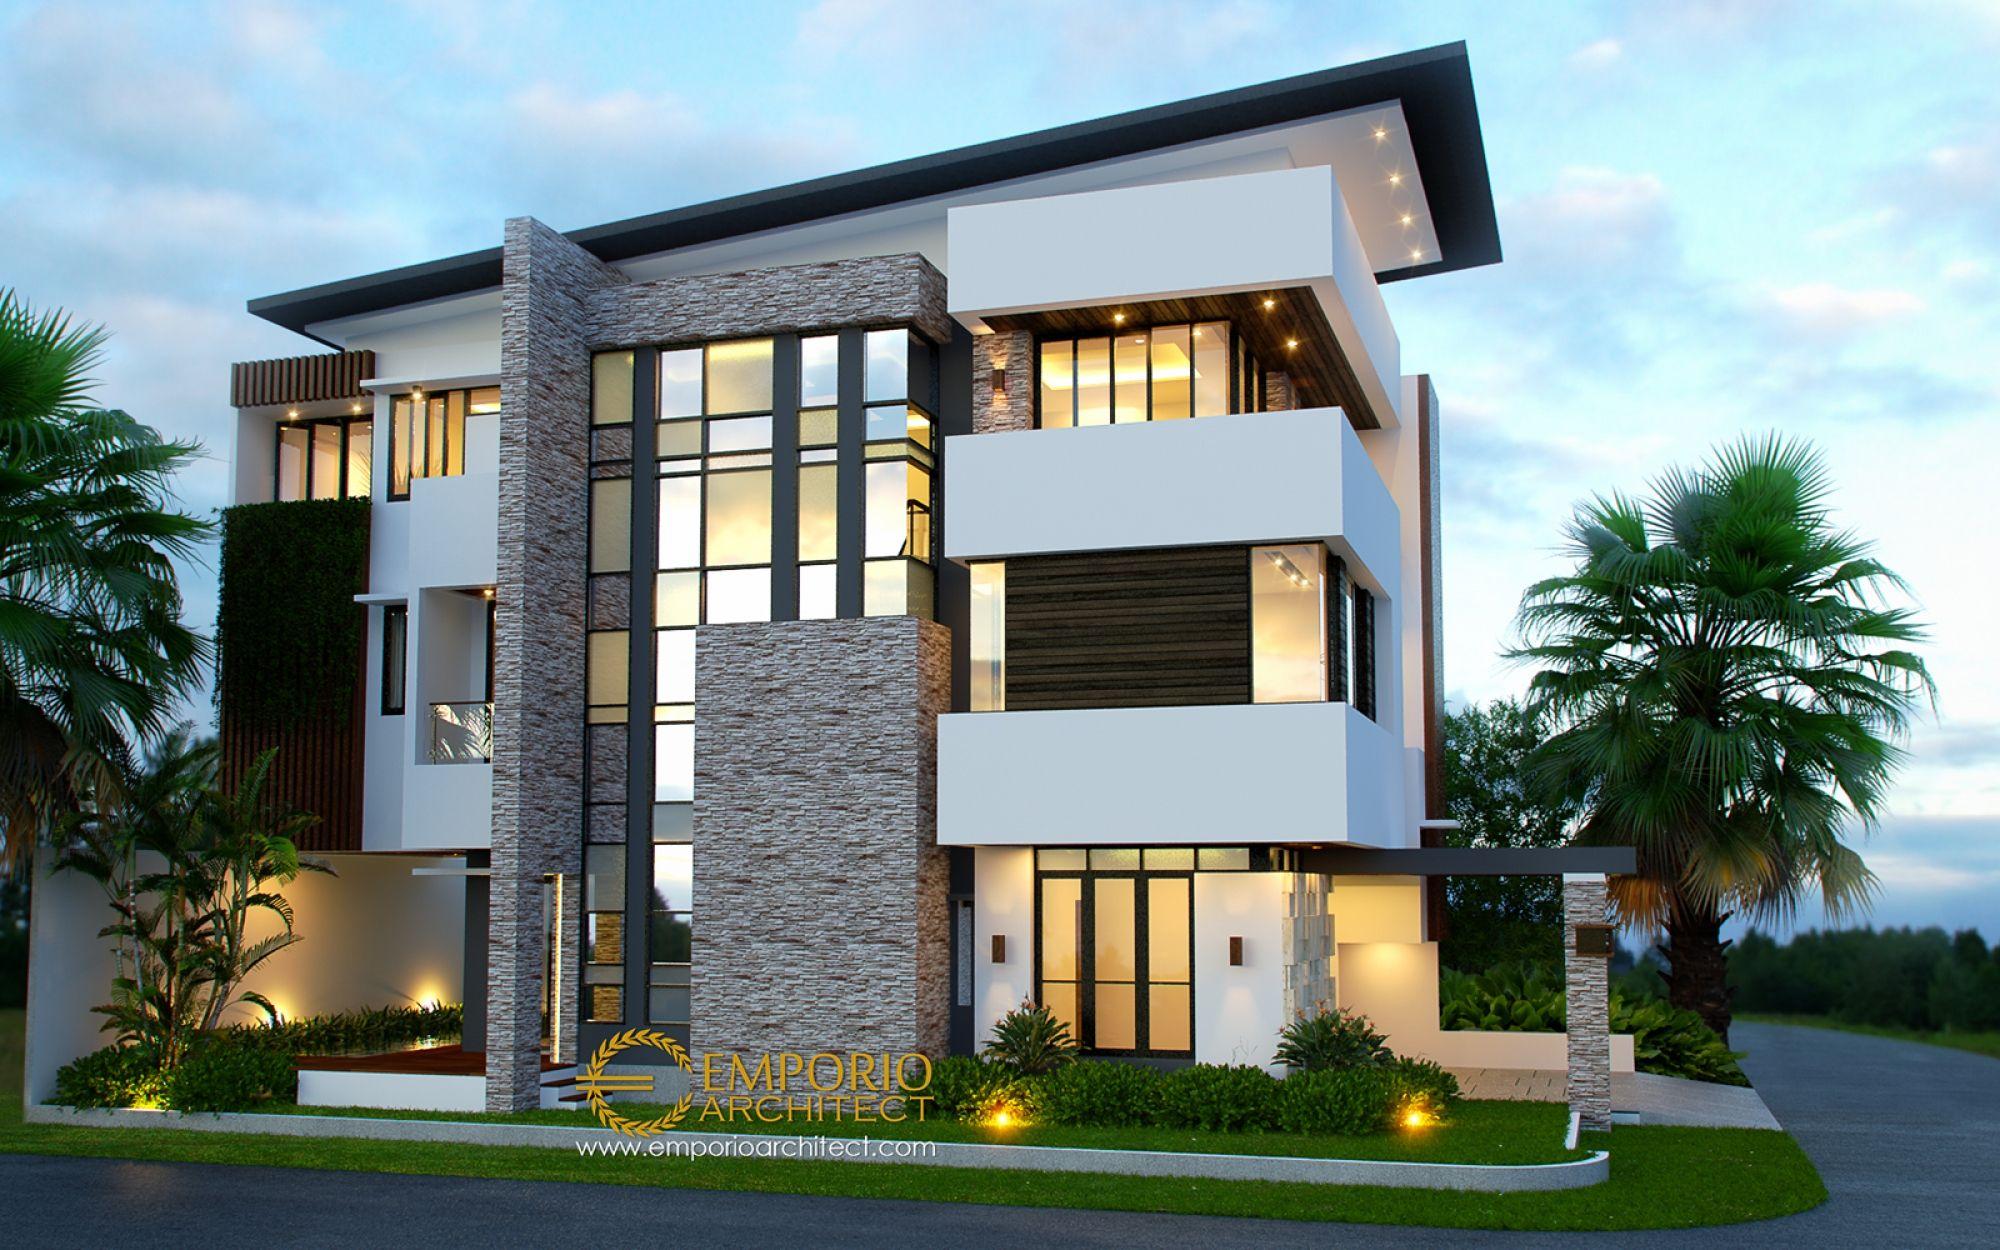 Dream House Design Desain rumah, Arsitek, Home fashion